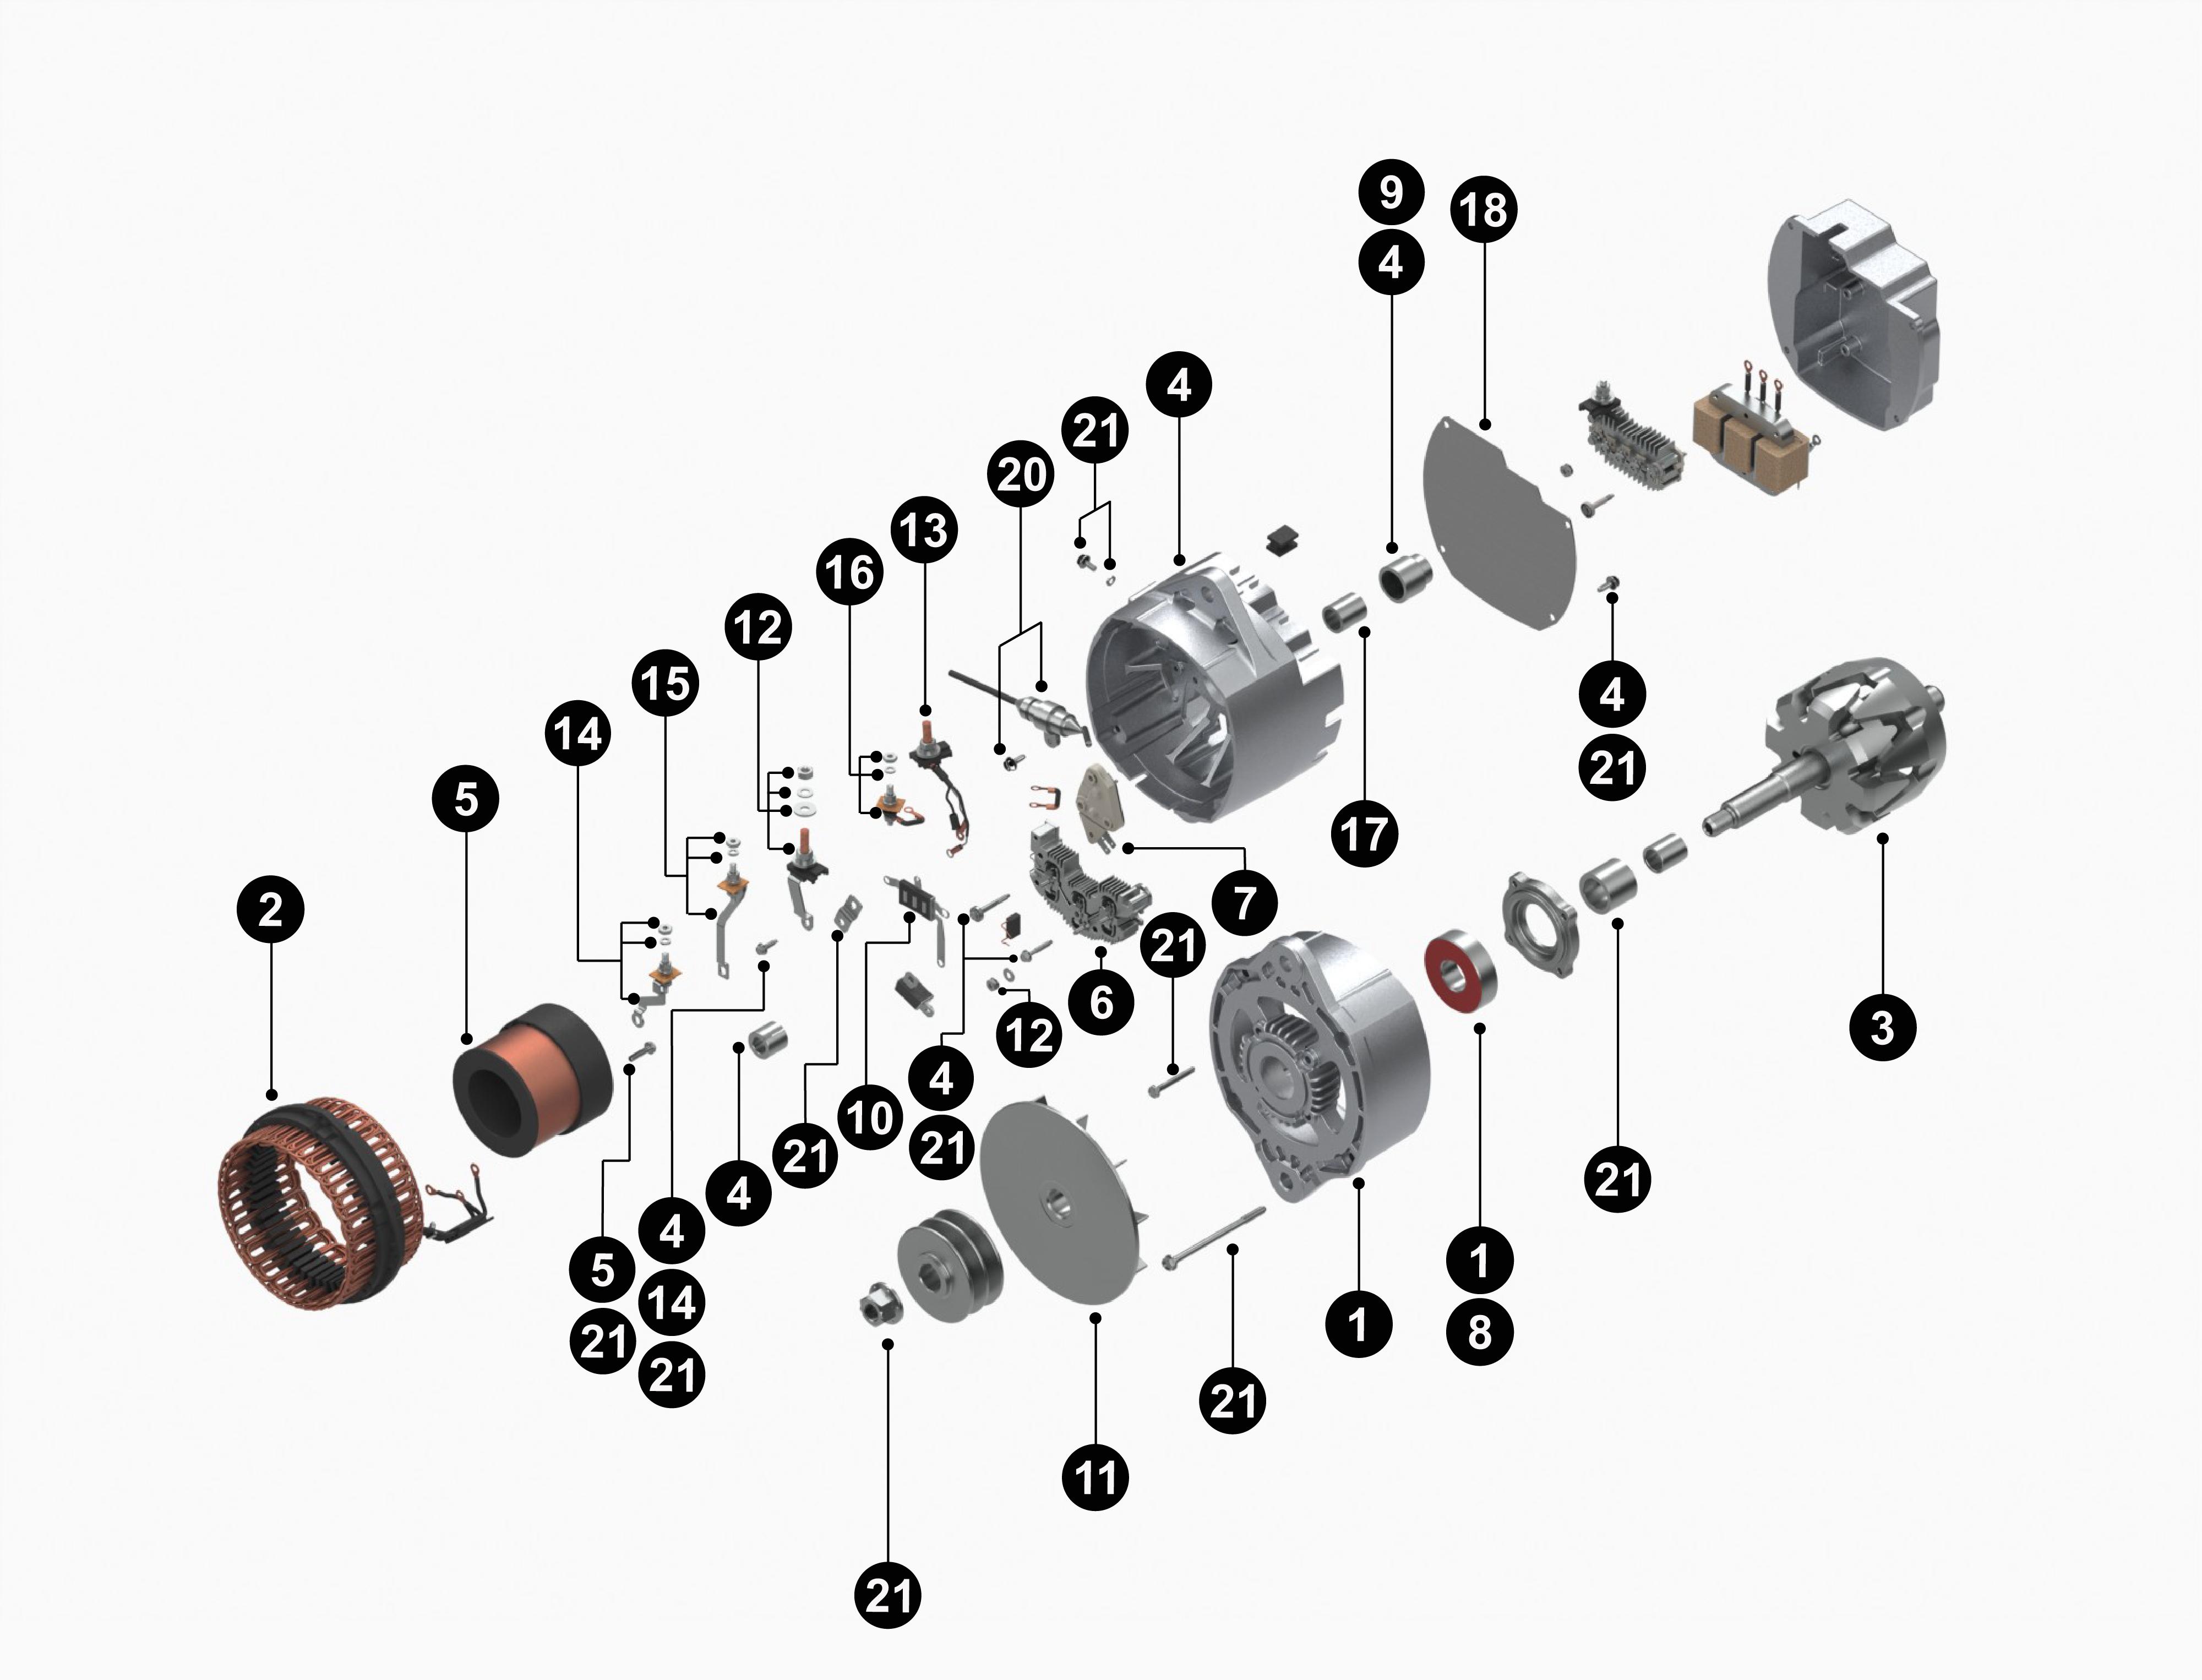 34SI Service Parts service parts